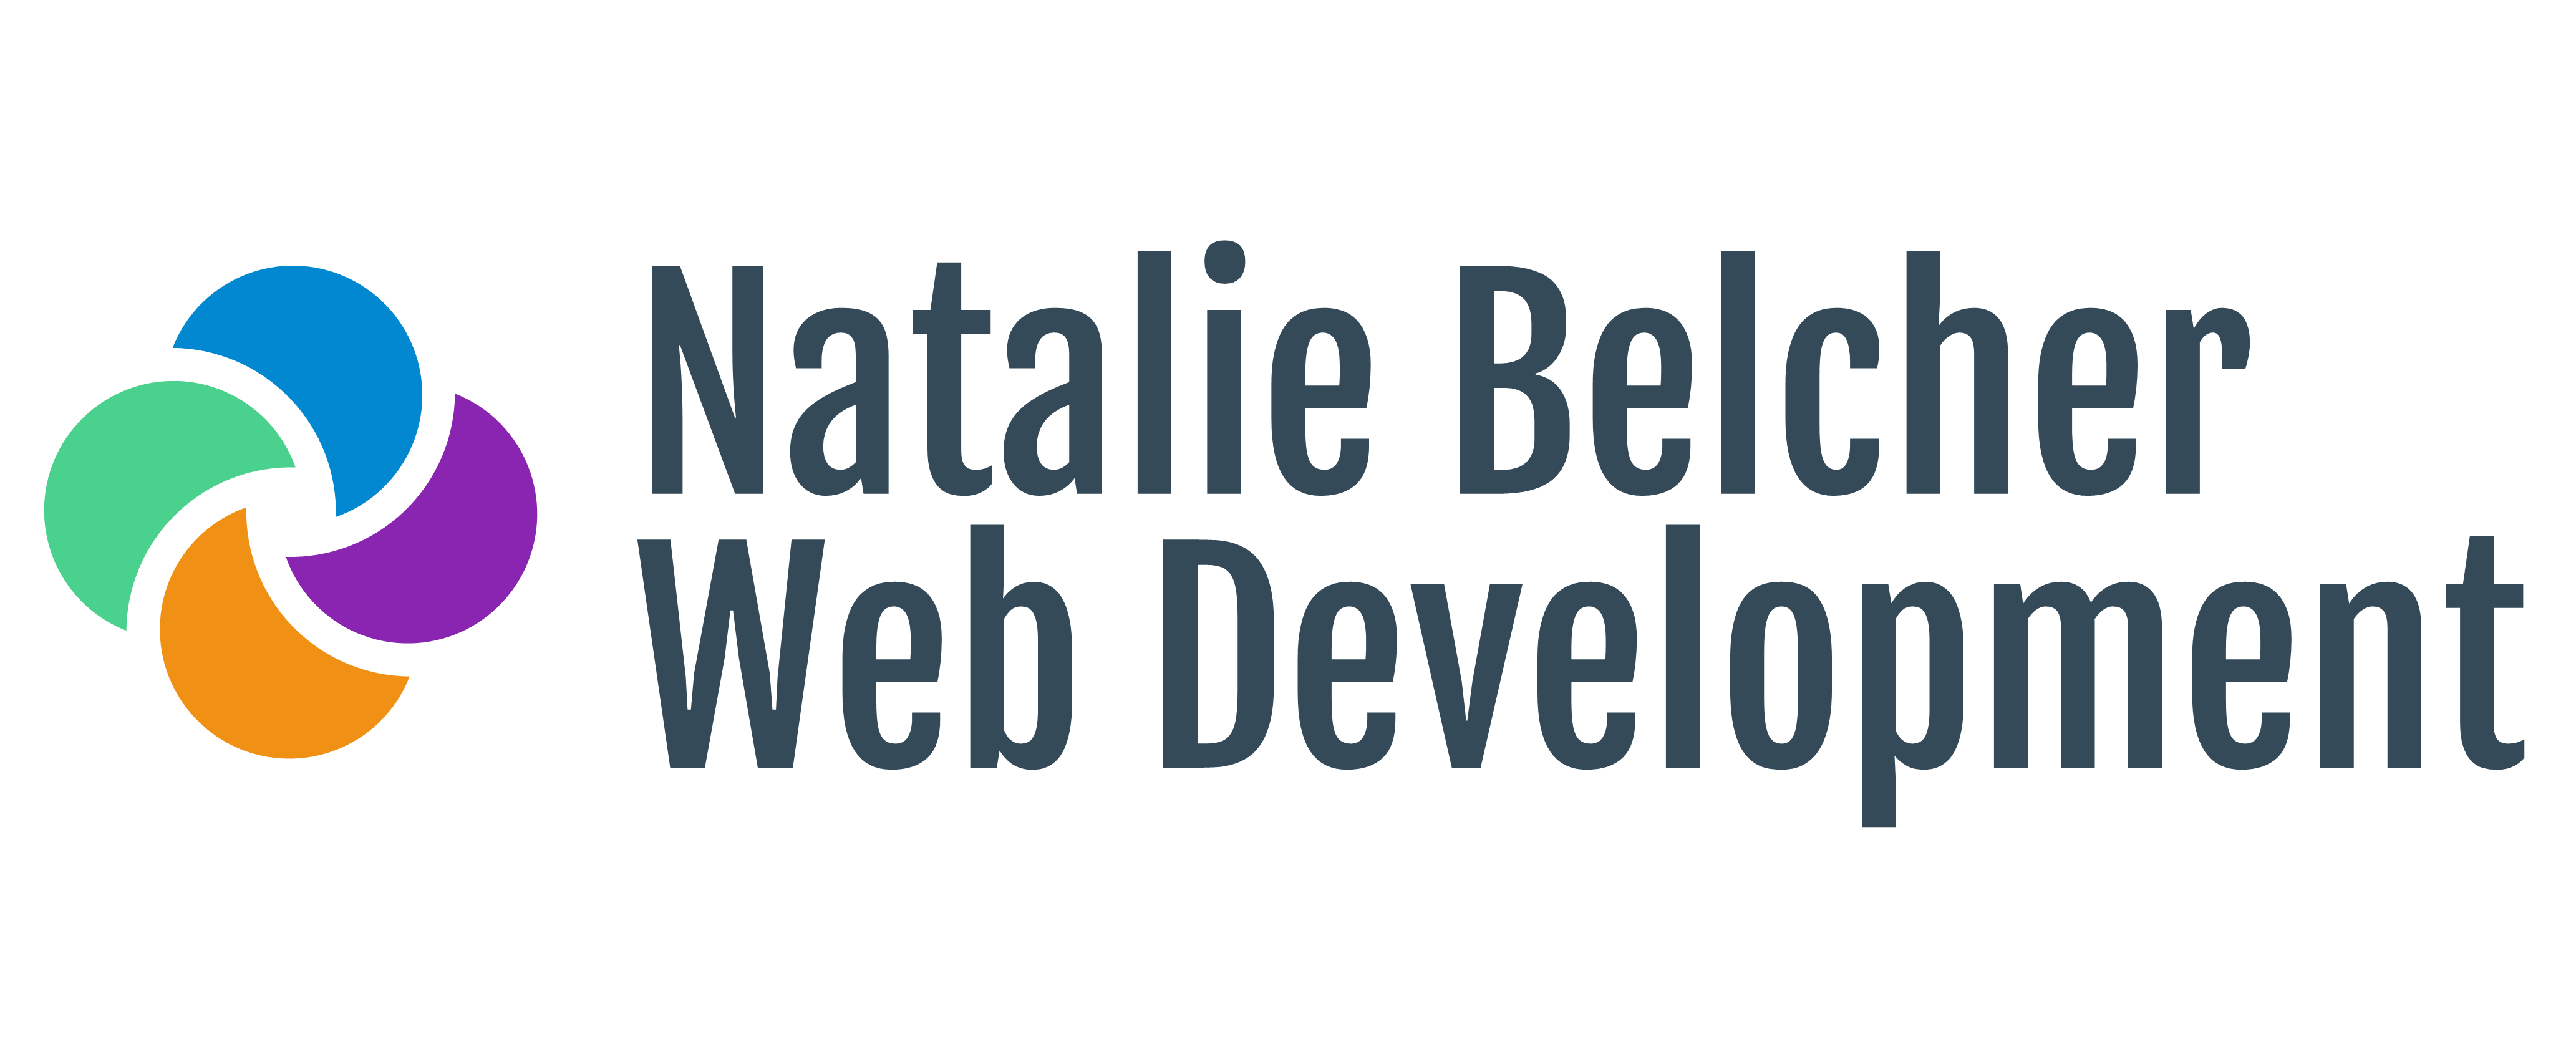 Natalie Belcher Web Development logo